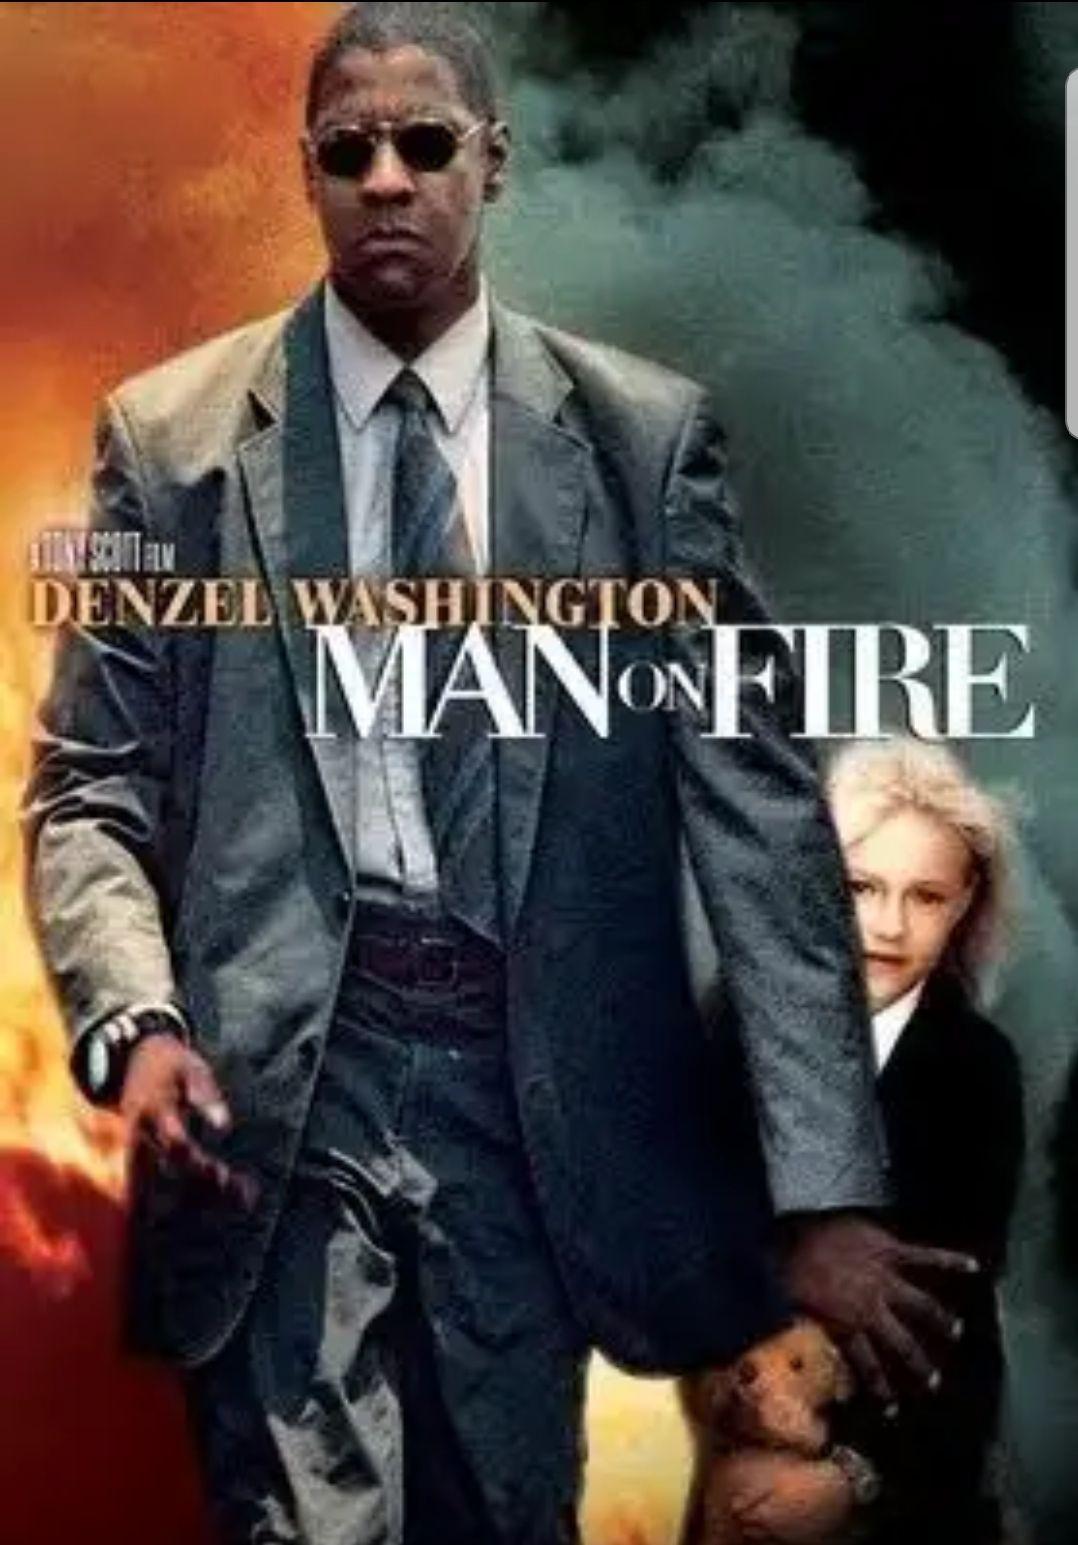 man on fire movie hd